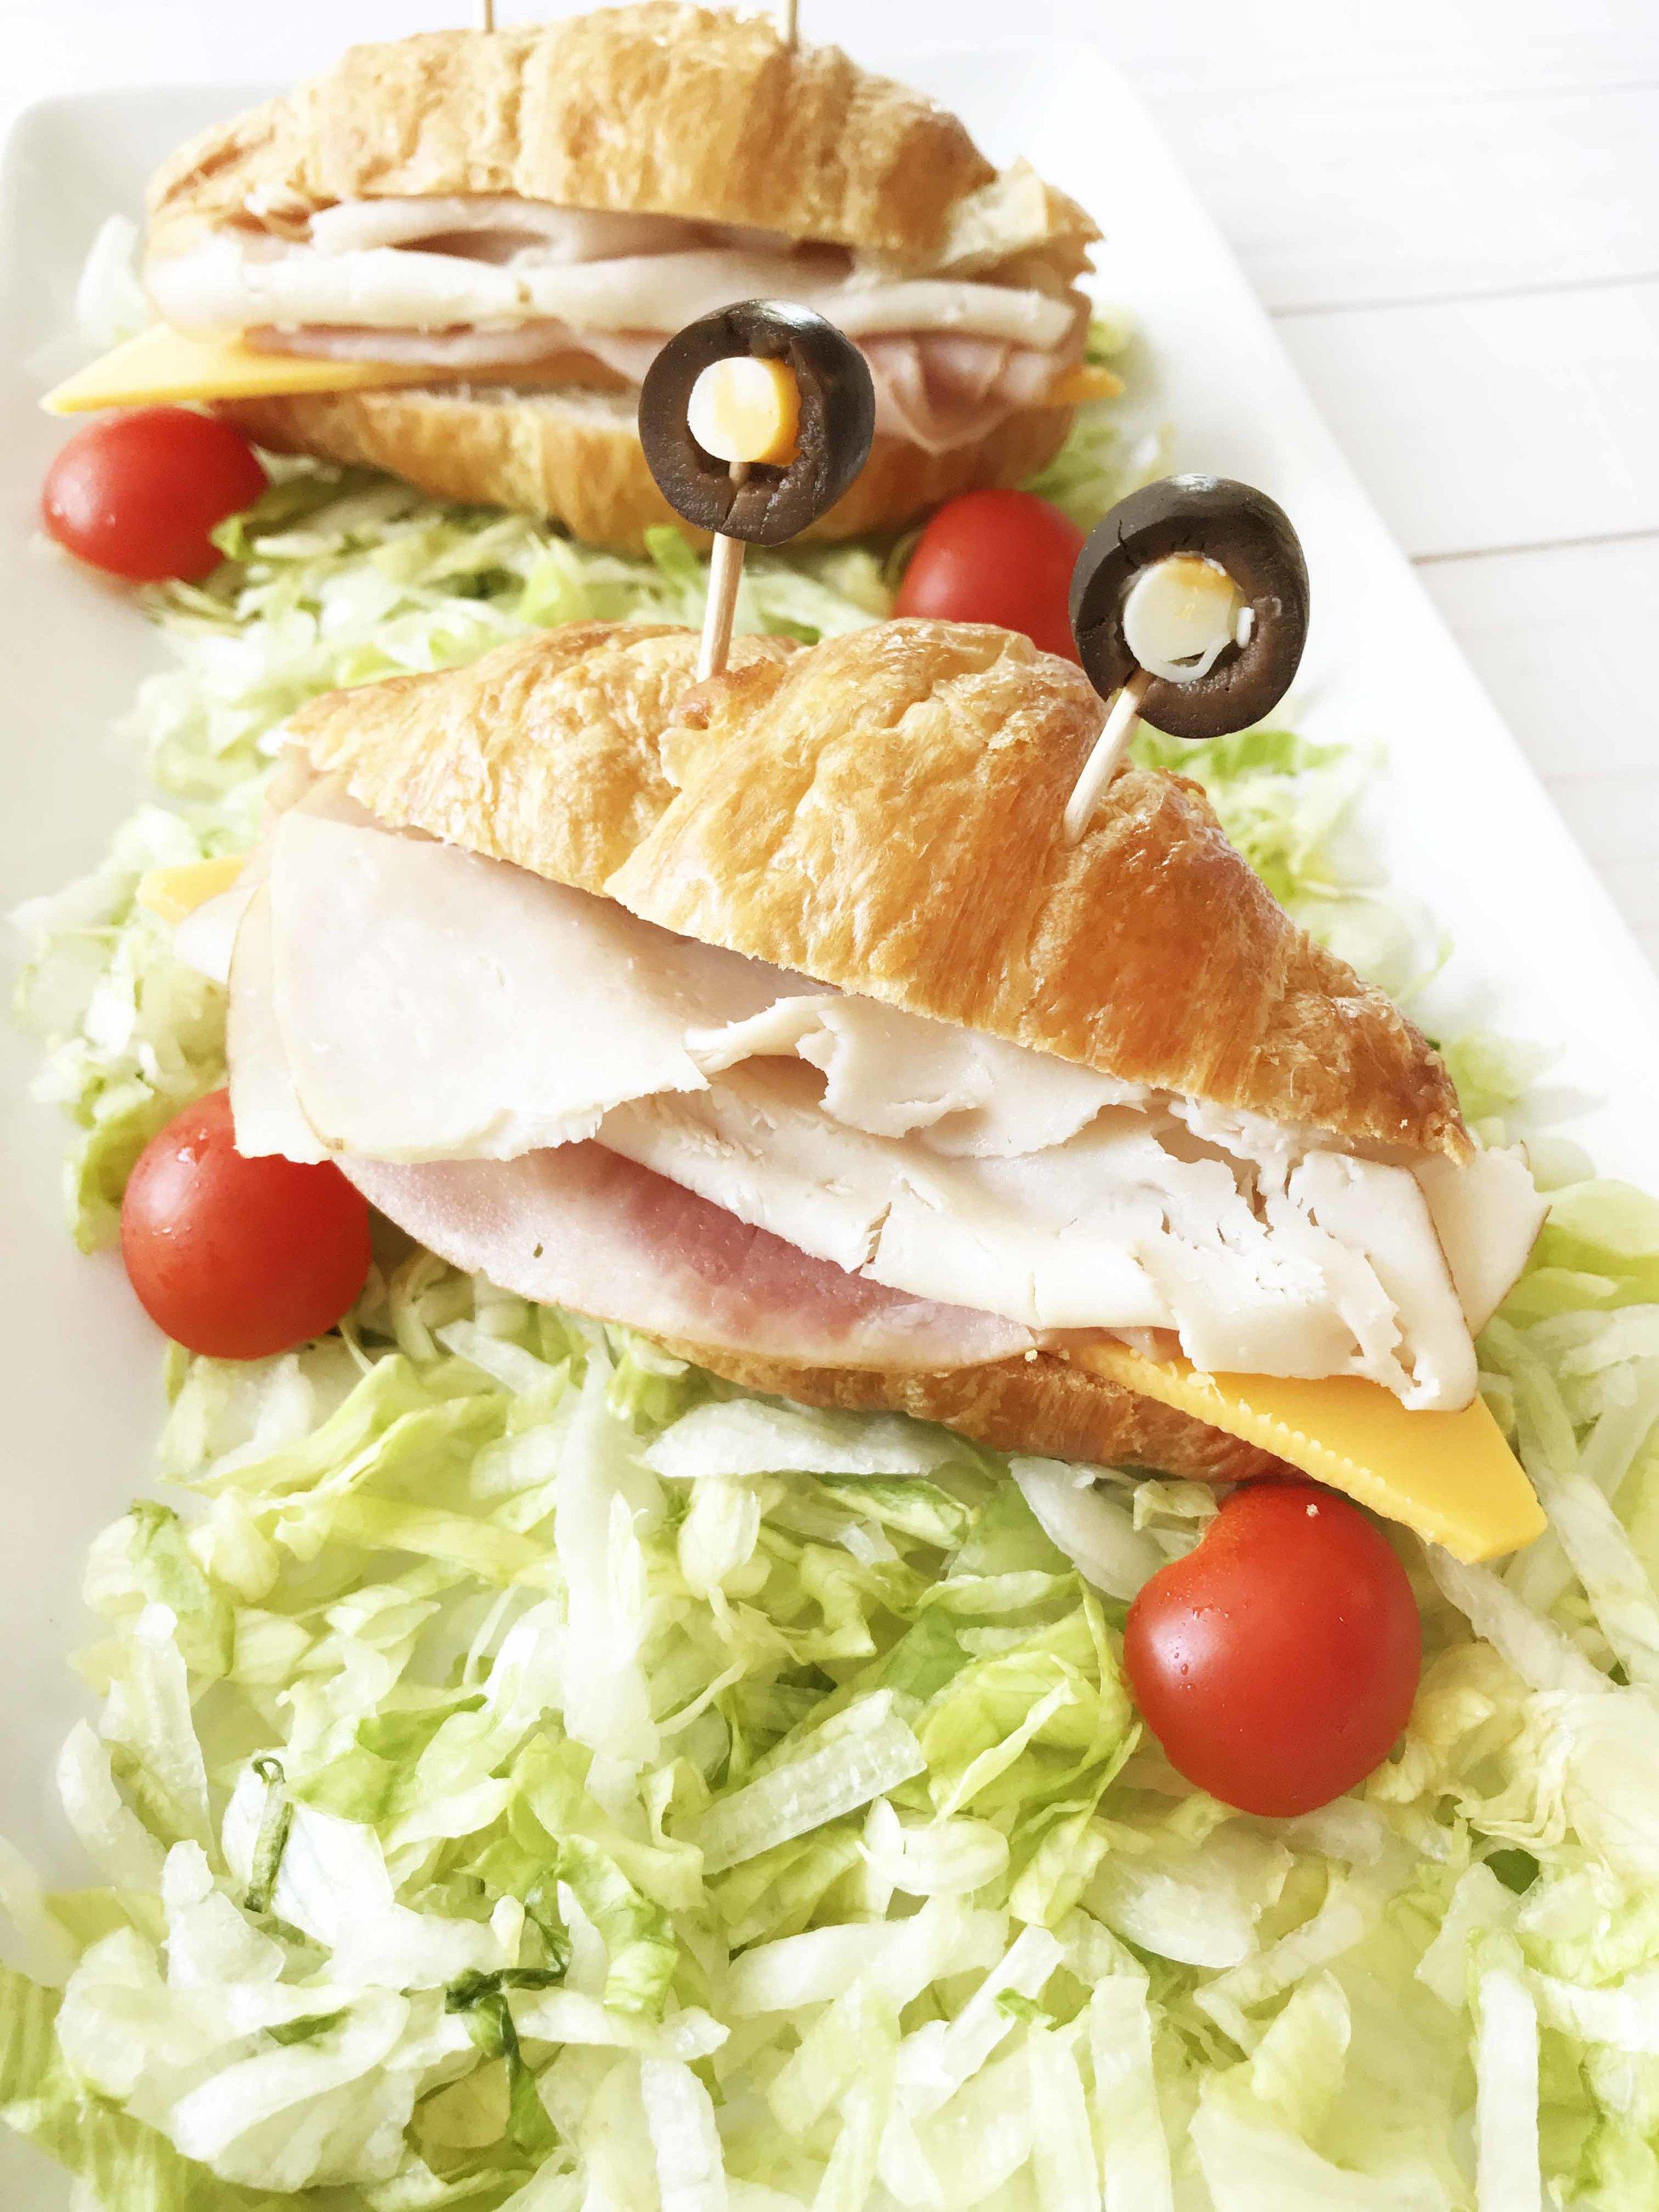 crabby-sandwich6.jpg